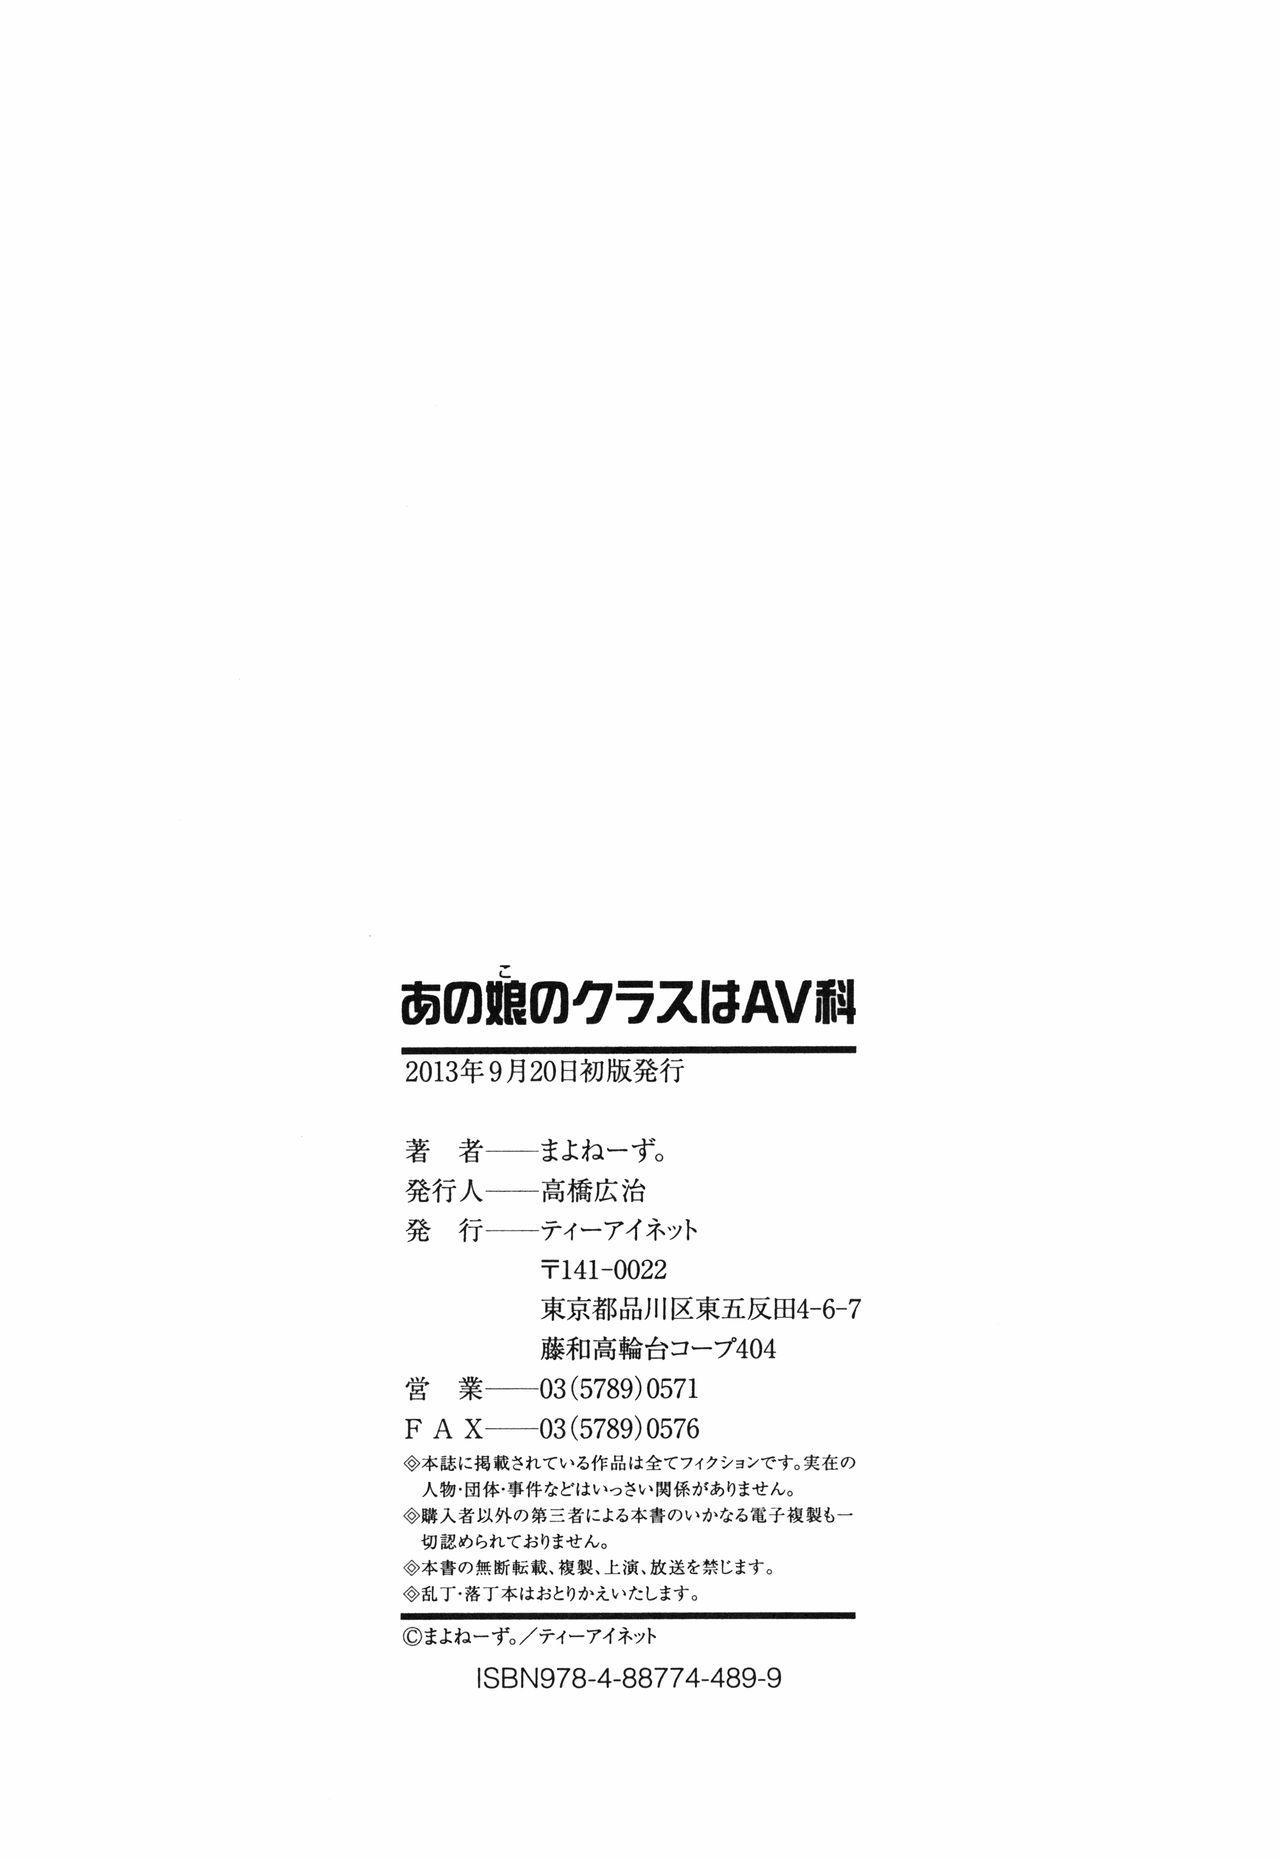 Anoko no Class wa AV-ka 220